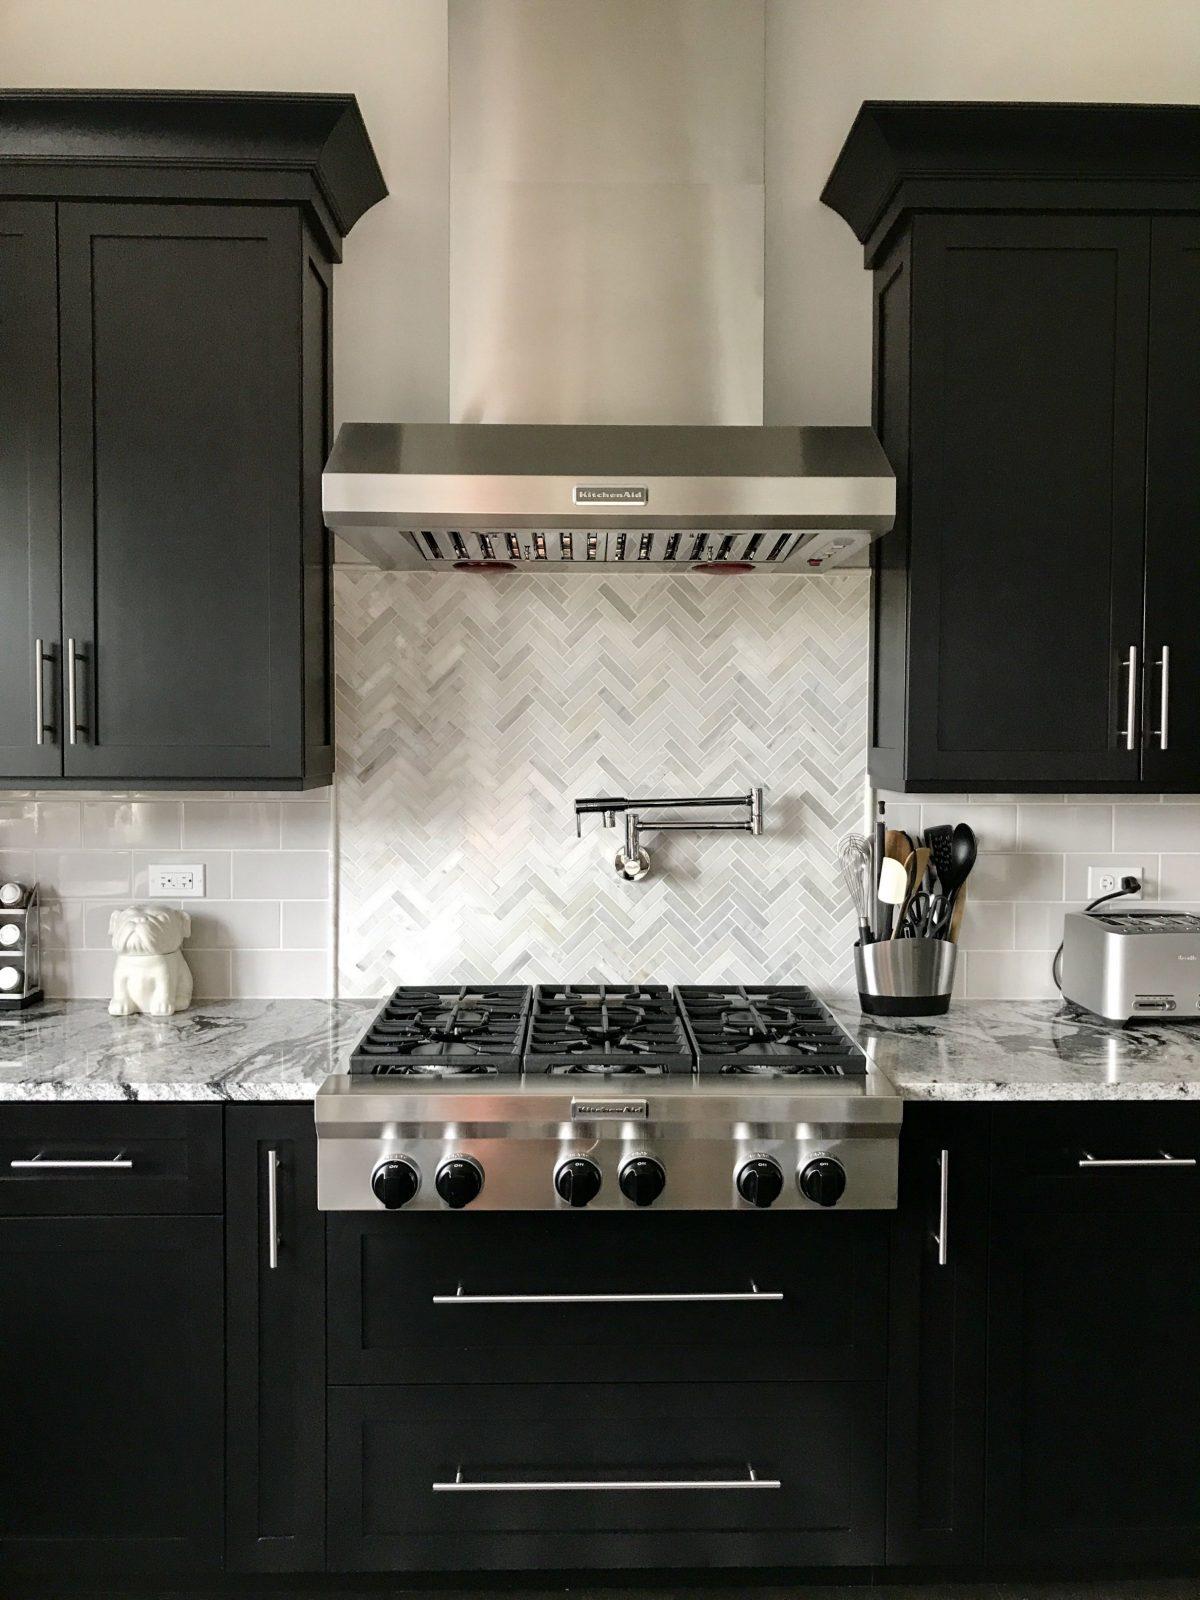 Espresso Cabinets With Light Grey Subway Backsplash Herringbone von Backsplash For Espresso Cabinets Bild